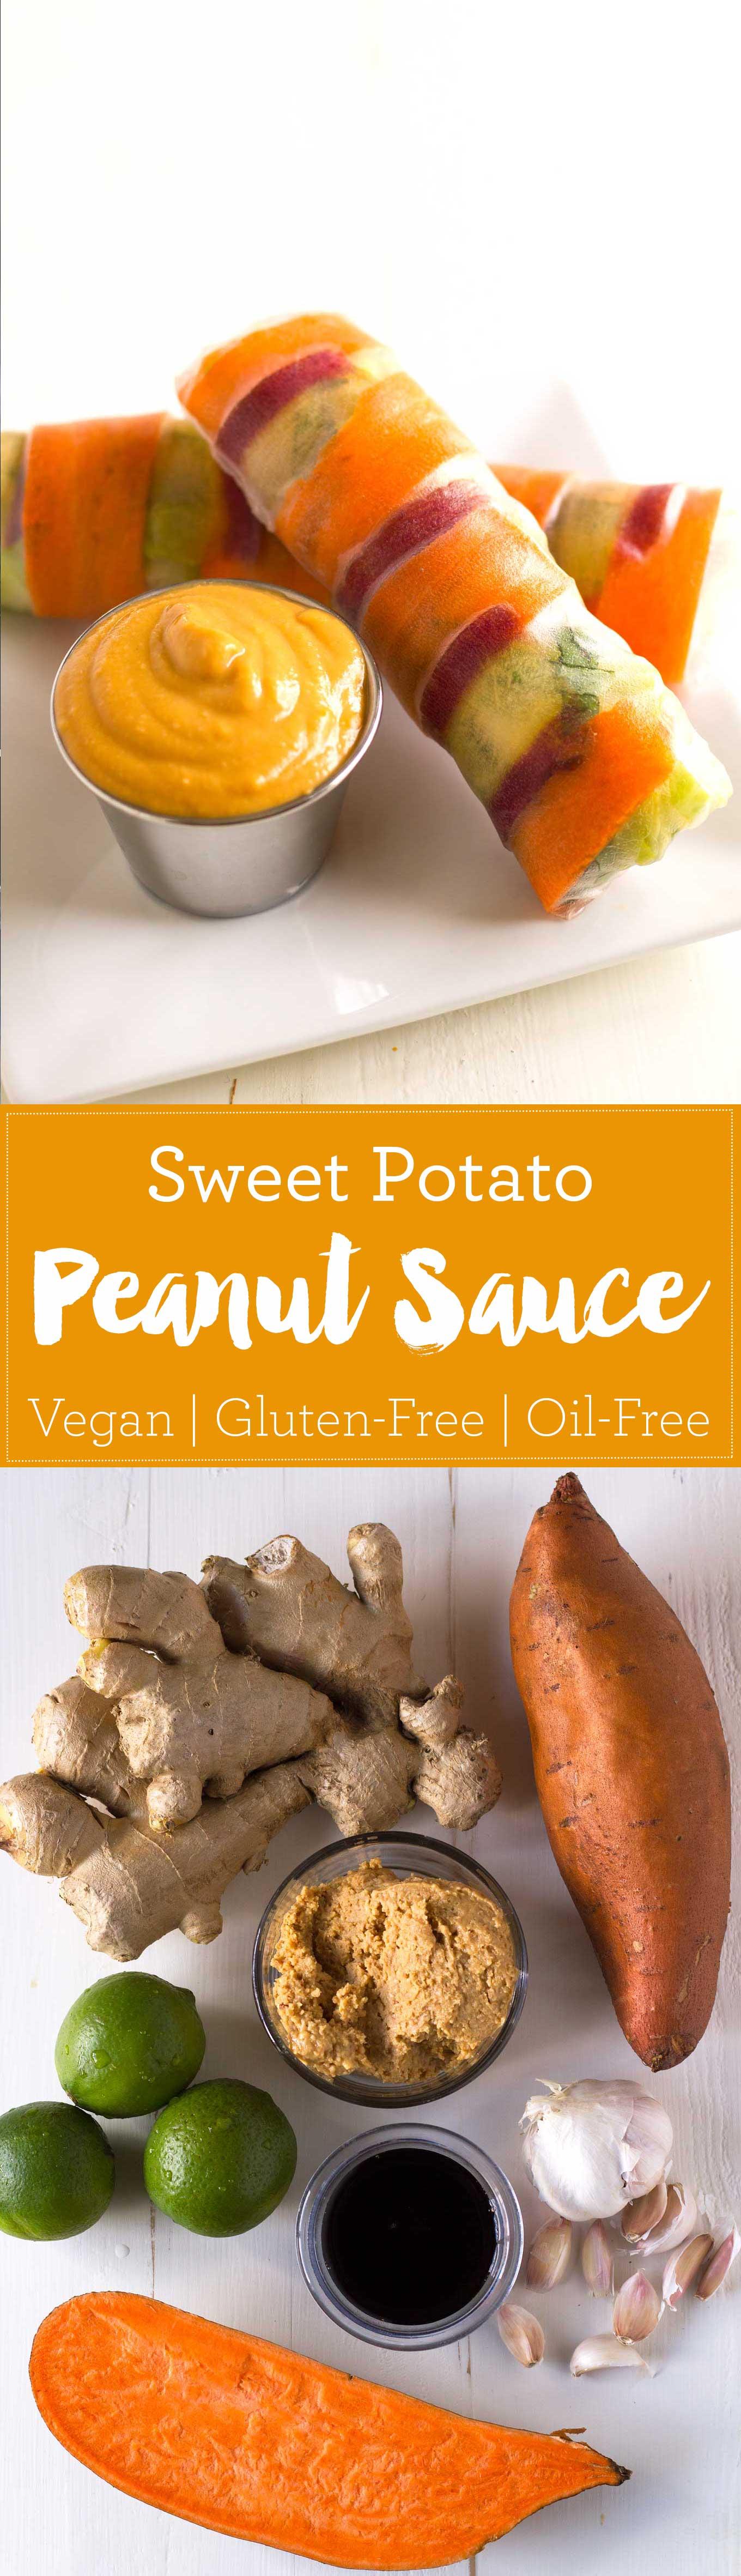 how much fiber in sweet potato